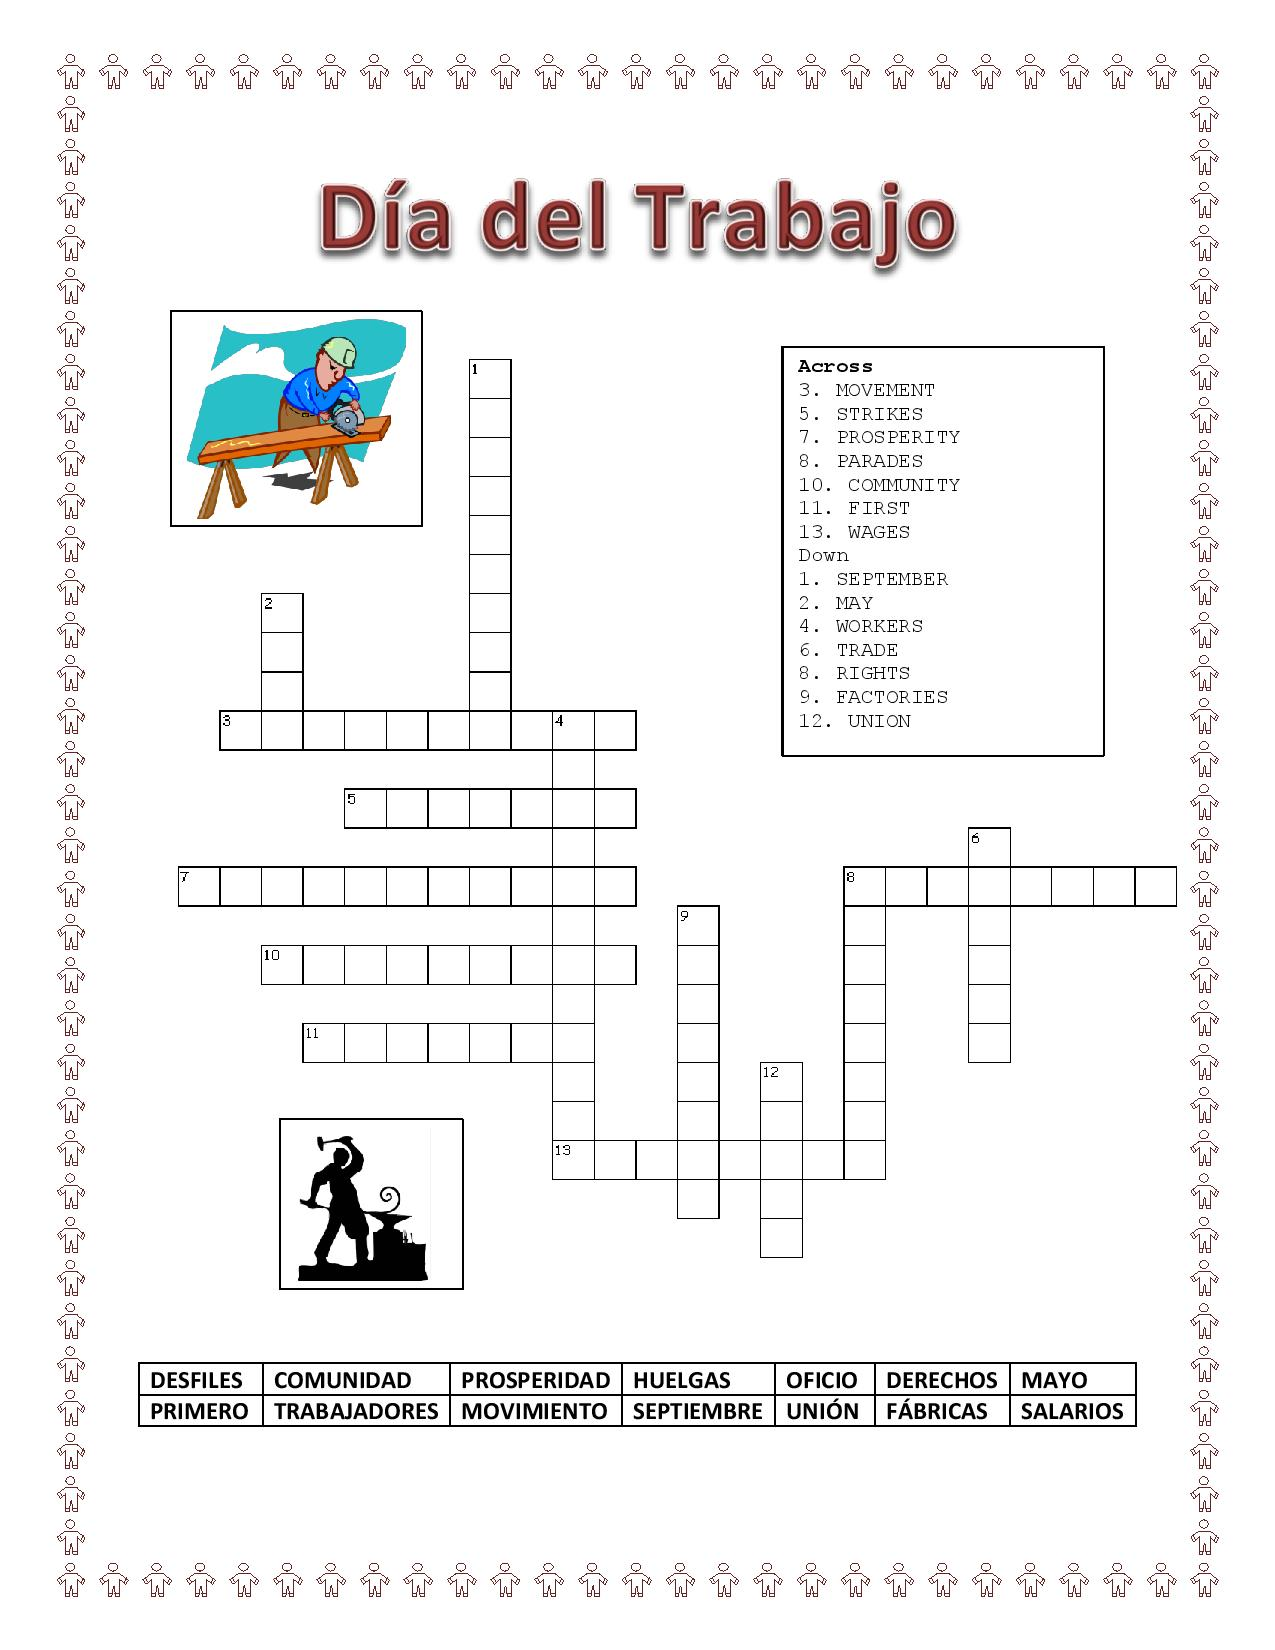 Labor Day Spanish Word Search Amp Criss Cross Puzzle Bonus